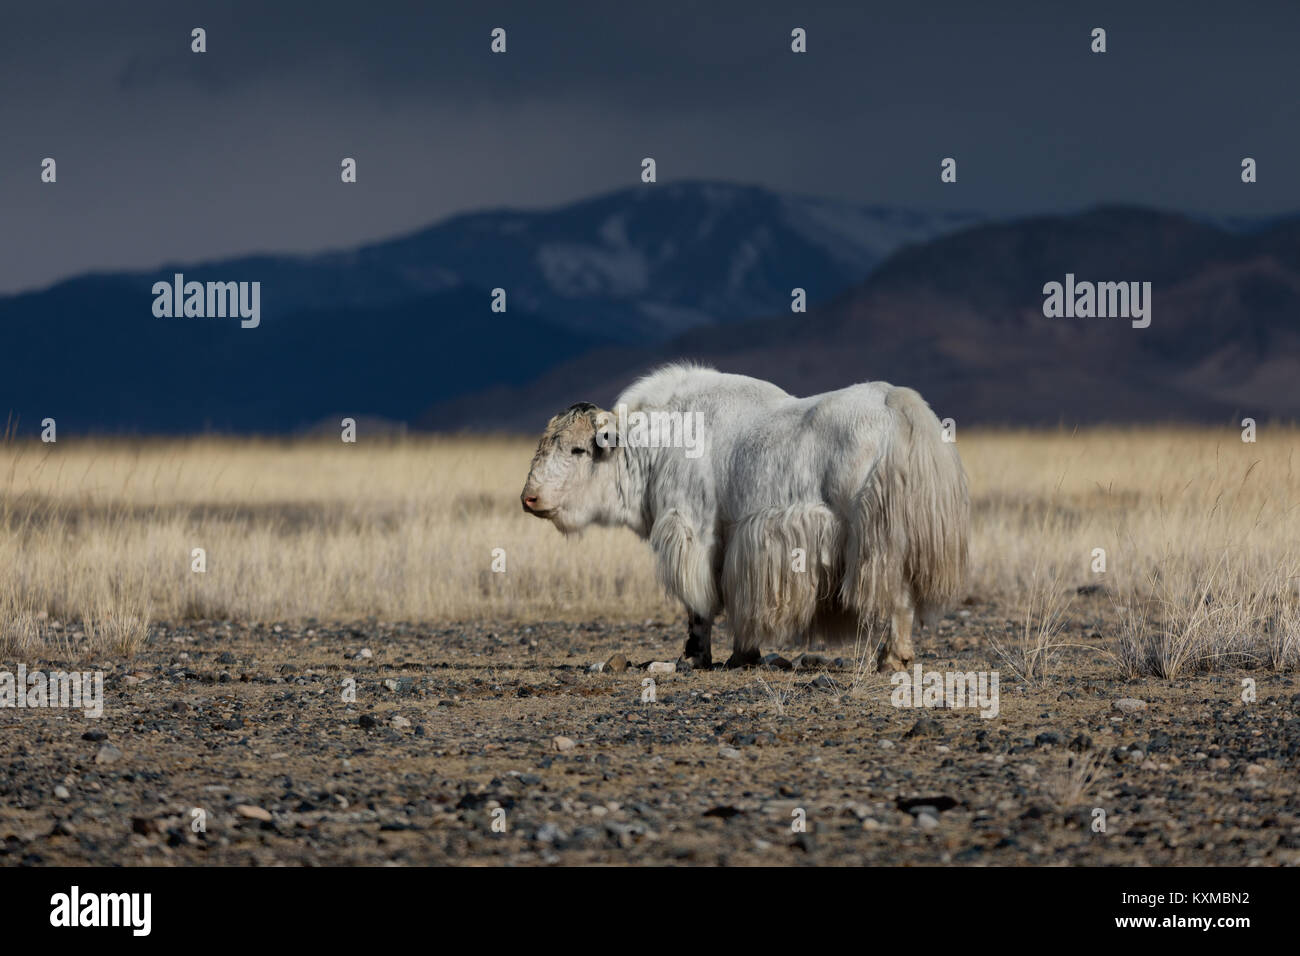 White yak Mongolia steppes grasslands plains winter Mongolian cow bull - Stock Image